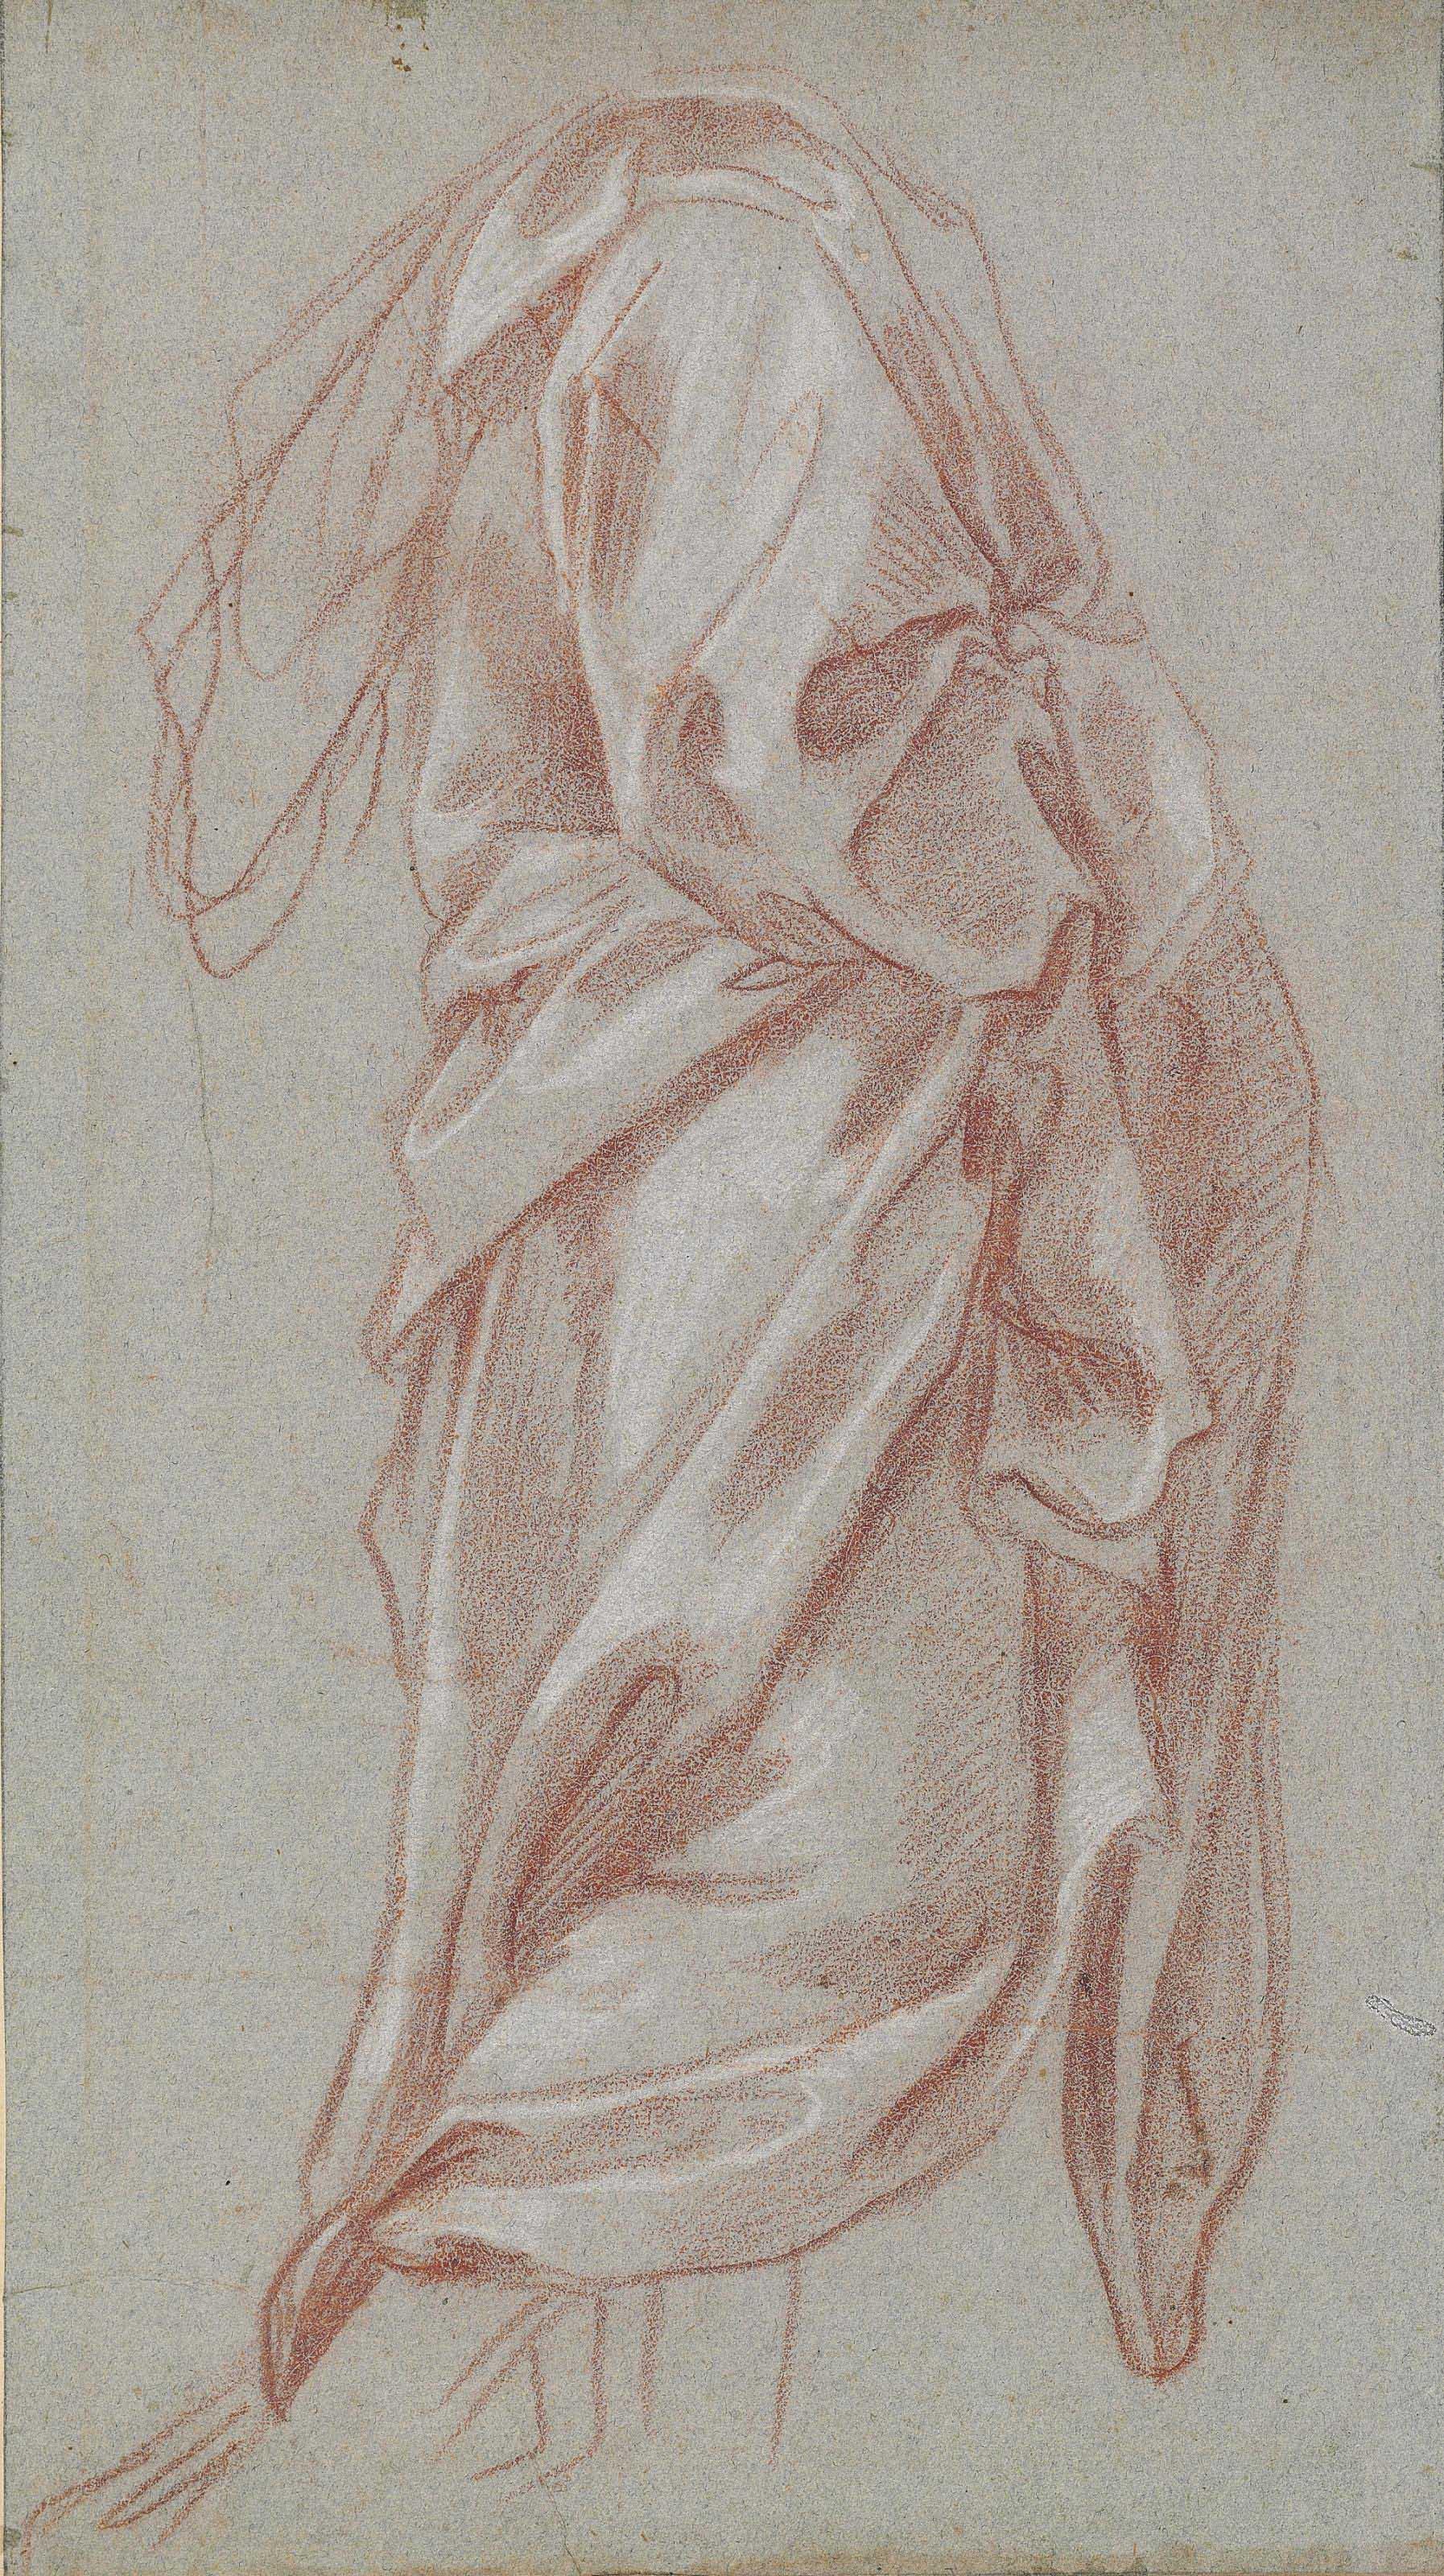 A drapery study of a standing figure